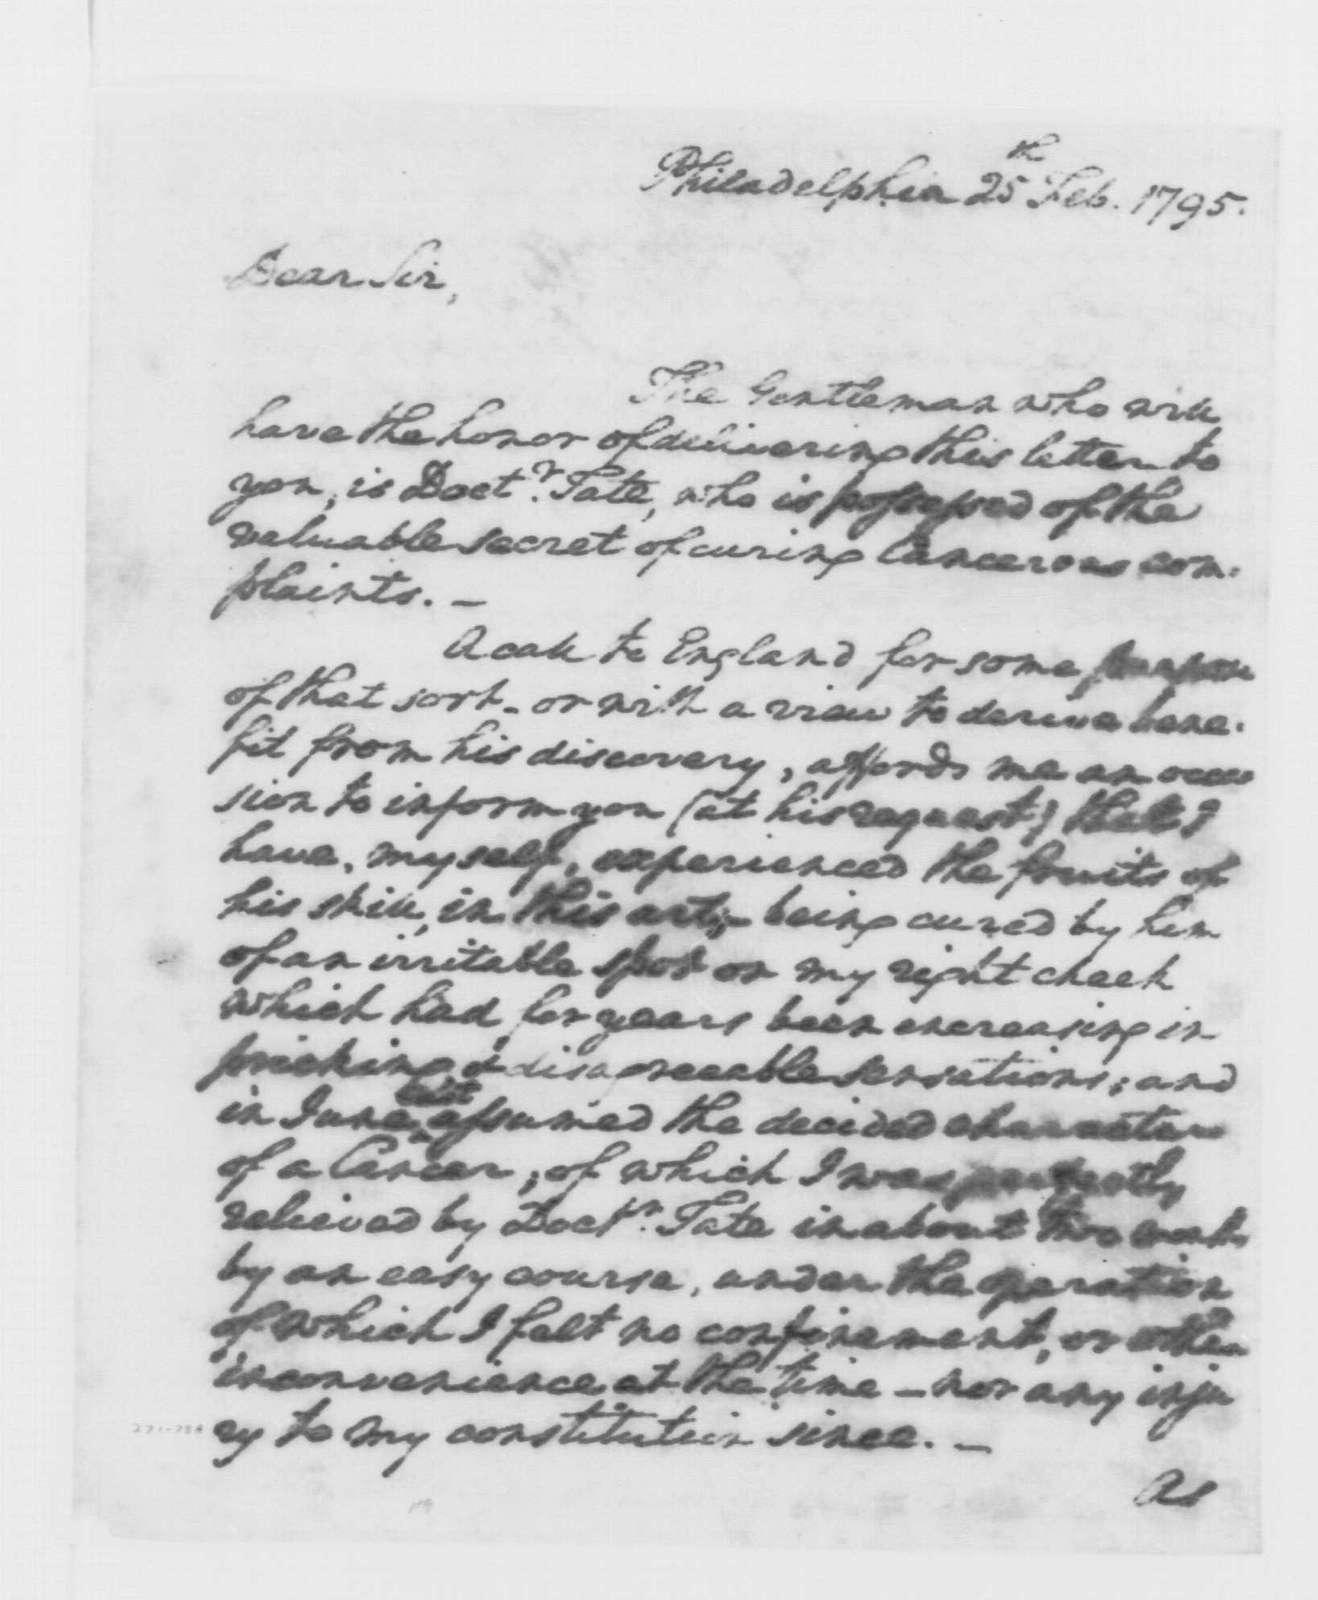 George Washington Papers, Series 4, General Correspondence: George Washington to Thomas Pinckney, February 25, 1795